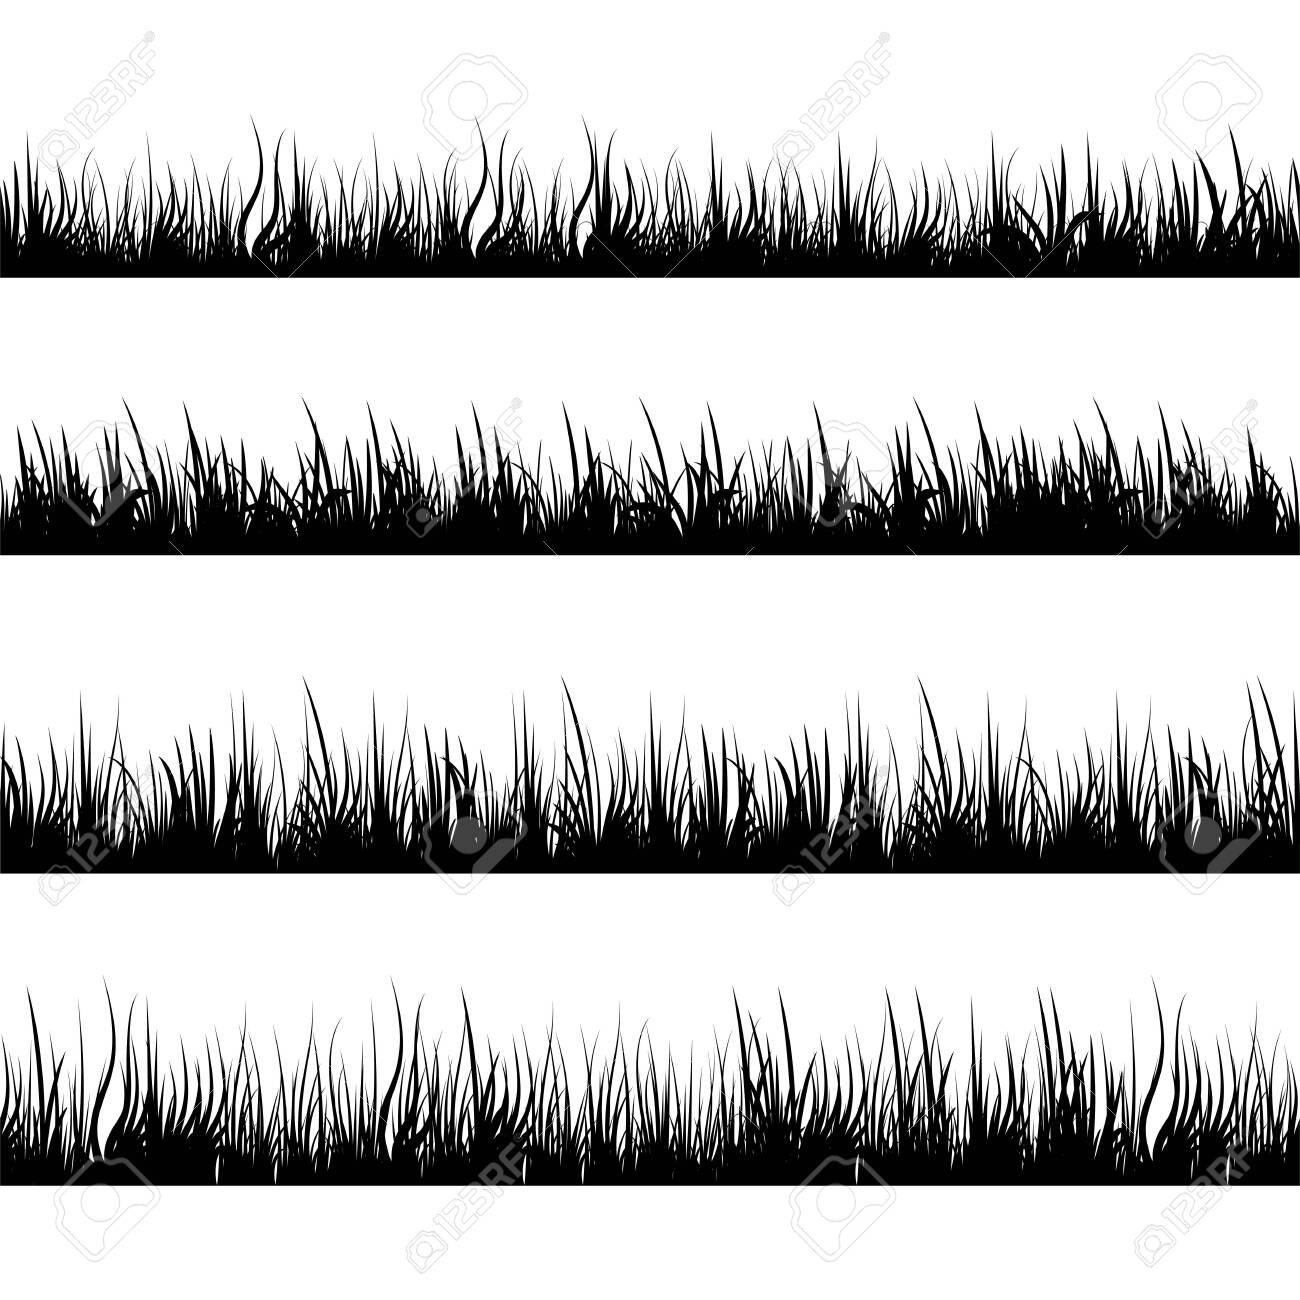 Grass silhouettes. Meadow landscape. Panorama black plants. Vector set. - 144460318